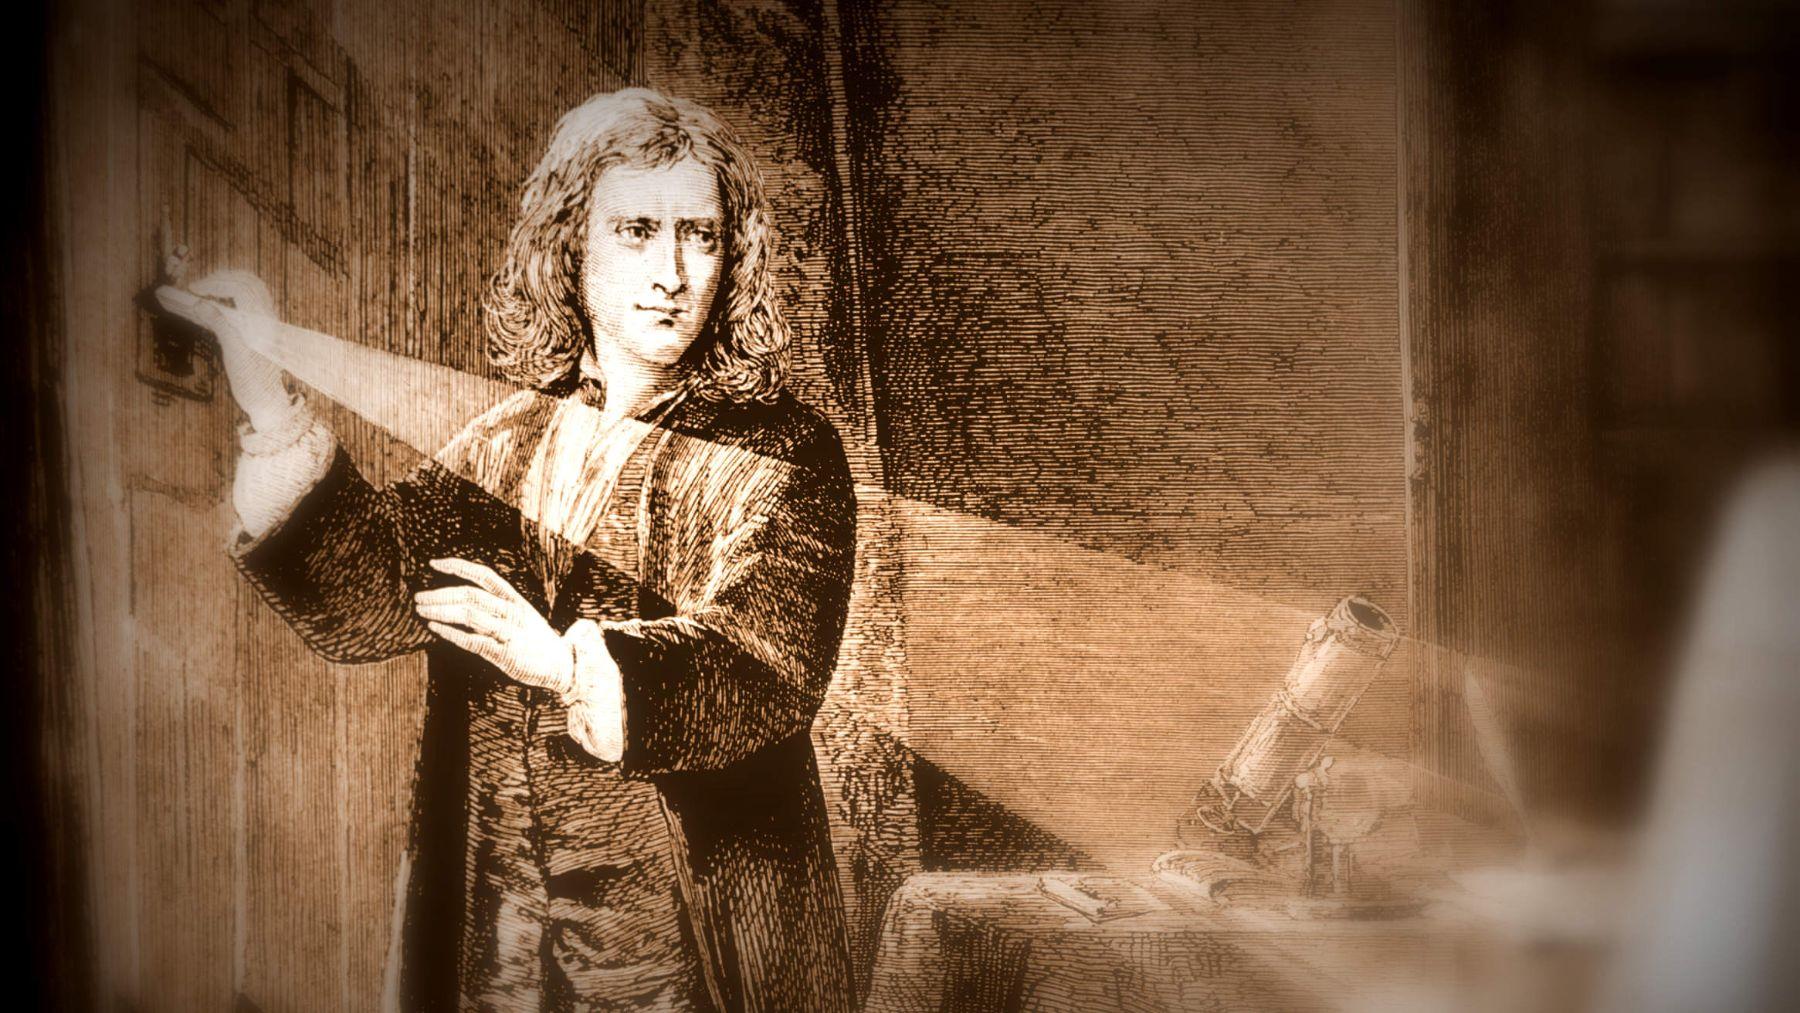 Descubre algunas de las frases más inspiradoras de Isaac Newton